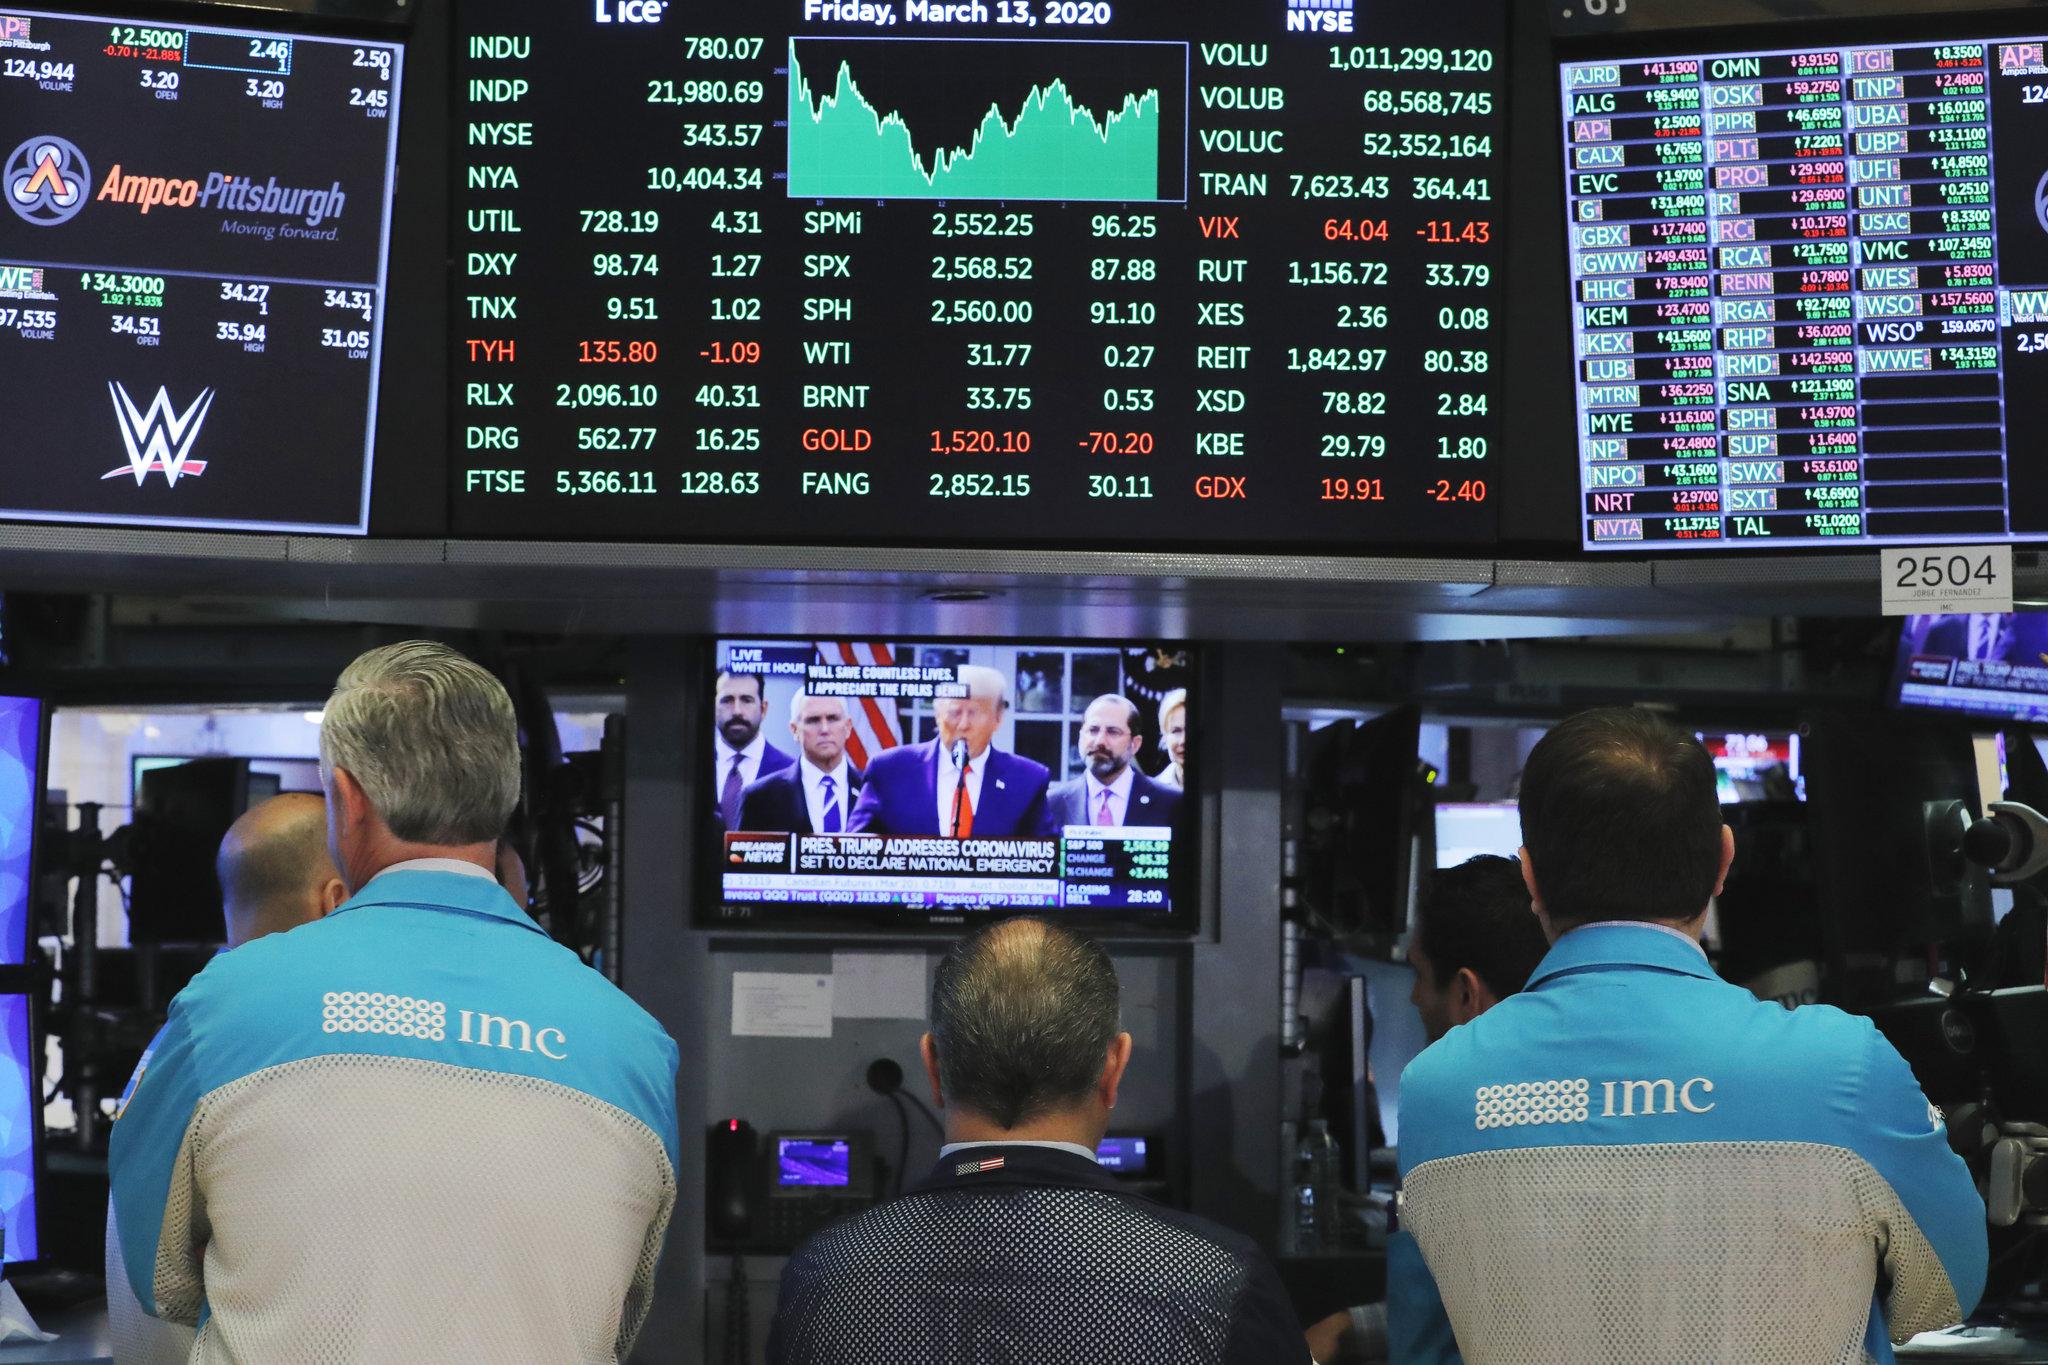 European stock markets retreat on virus concerns